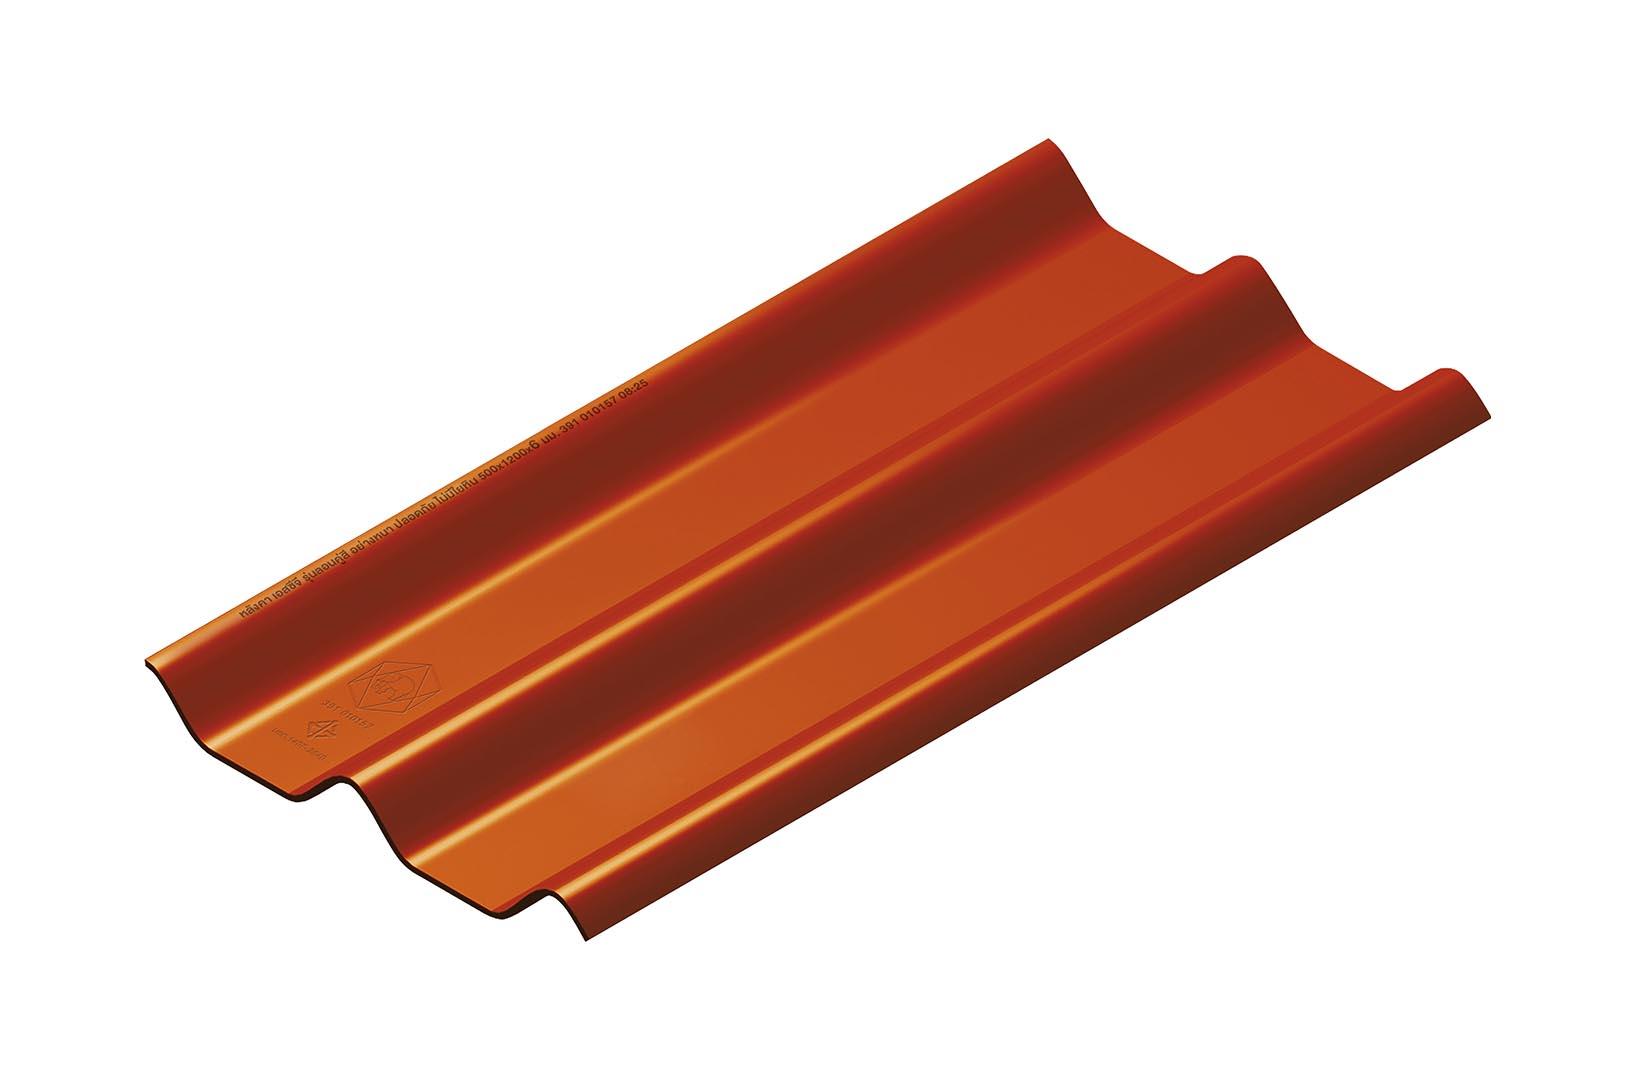 SCG-Fiber-Cement-Roof-Roman-Tile-Brown